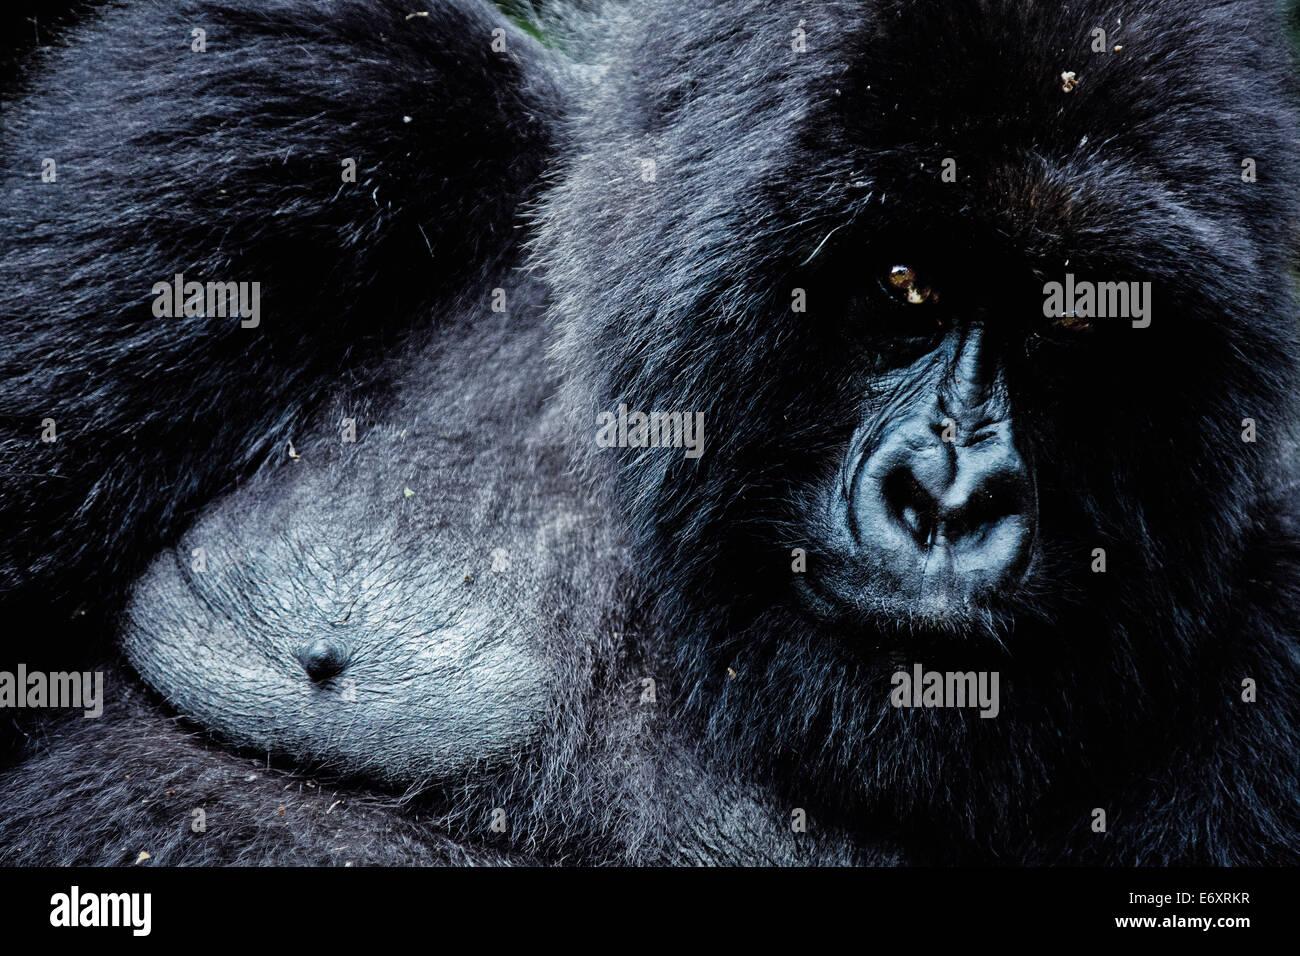 Mountain gorilla in Volcanoes National Park, Ruanda, Africa Stock Photo